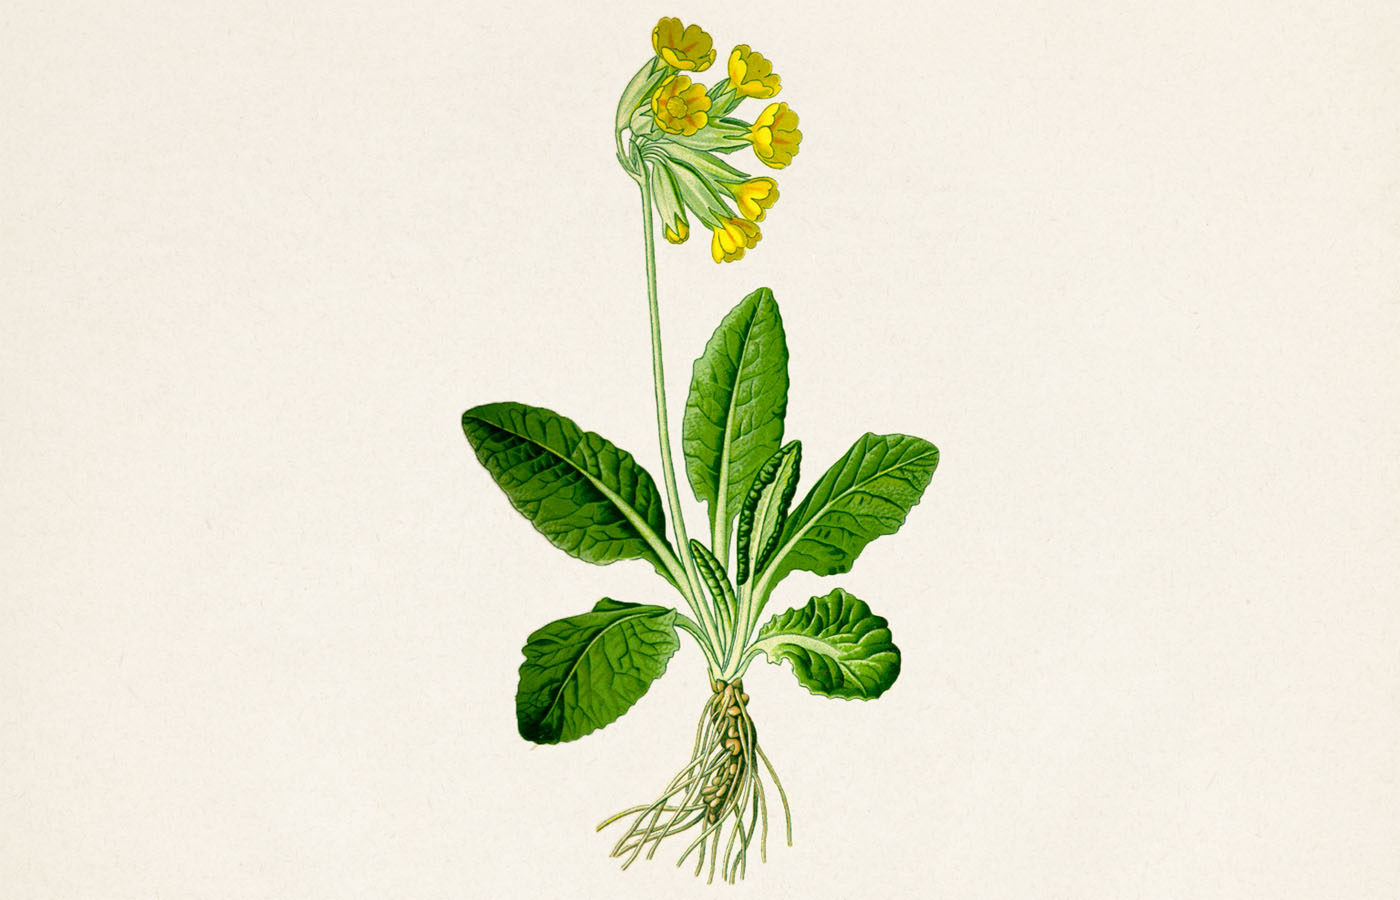 Prvosenka jarní (Primula veris)